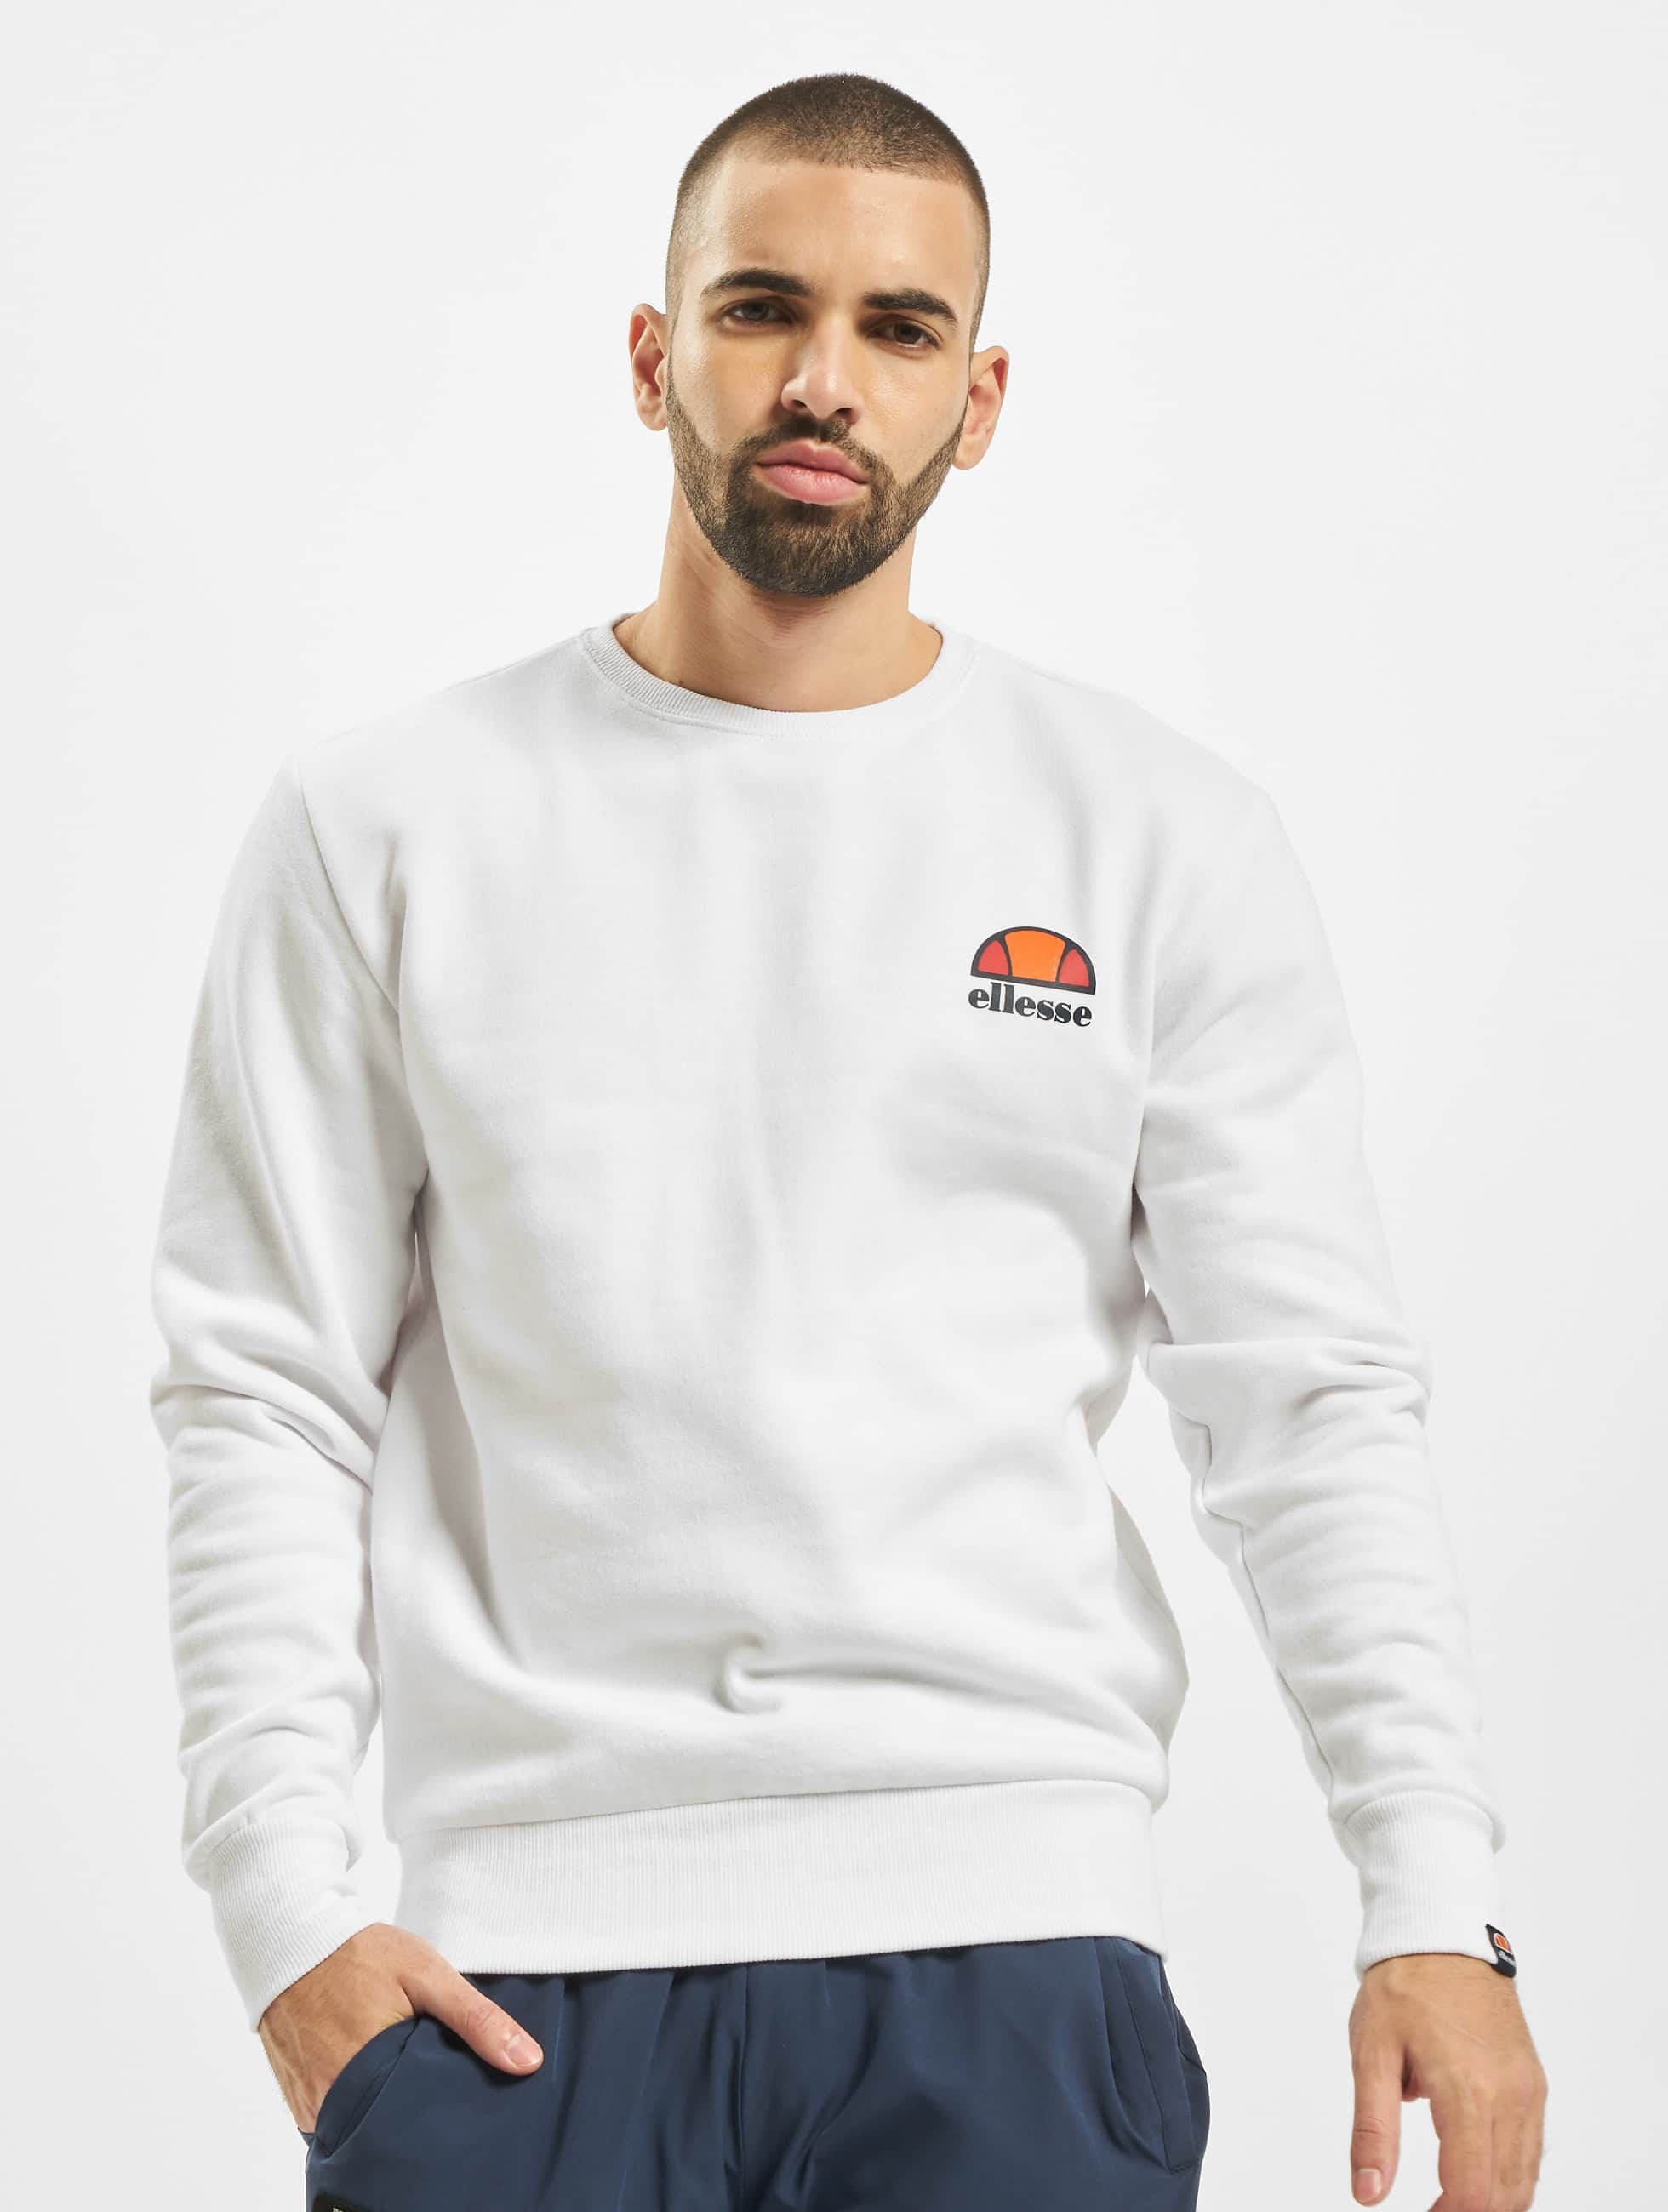 Ellesse Pullover Marken Adidas Nike